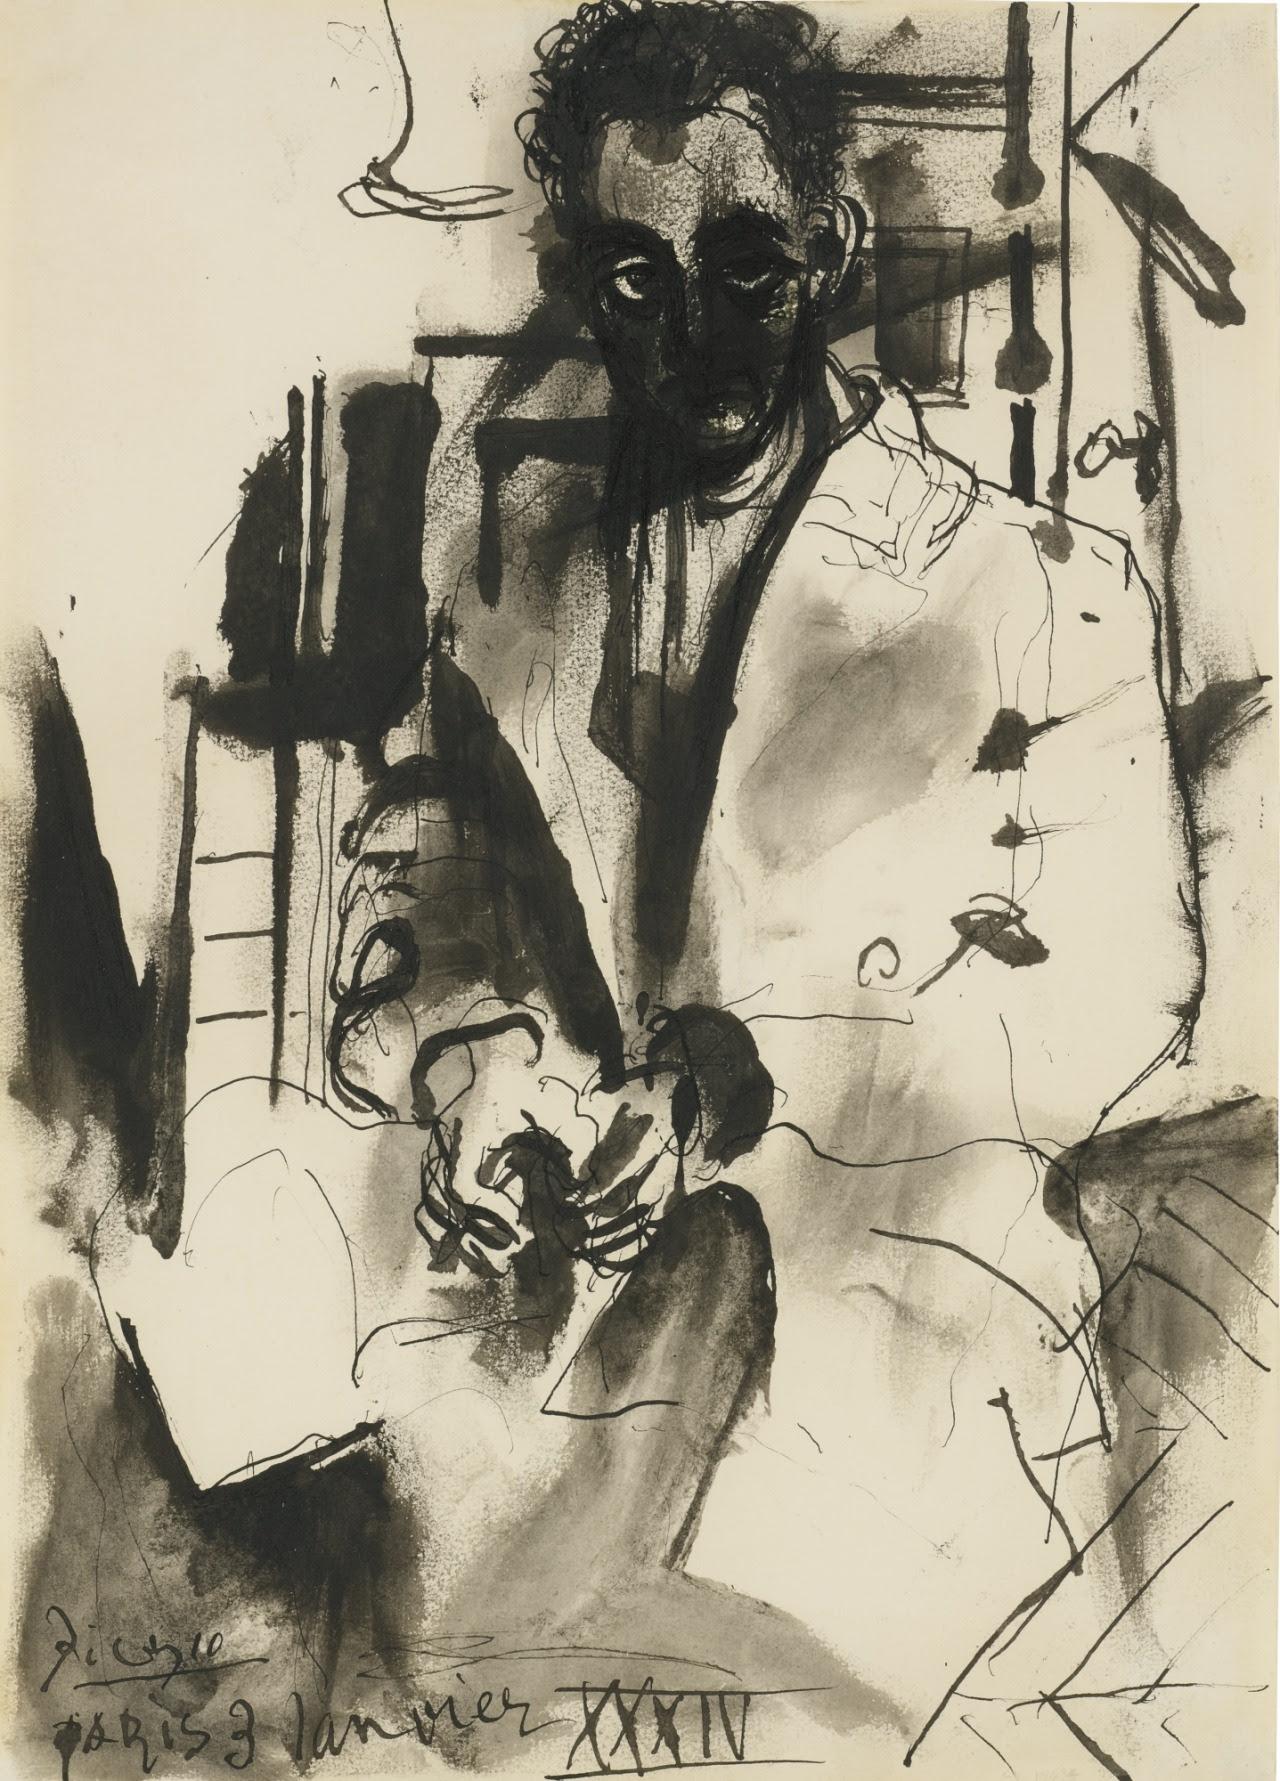 blastedheath:  Pablo Picasso (Spanish, 1881-1973), Portrait de Man Ray, January 3, 1934. Pen, brush and ink on paper, 35 x 24.7cm.